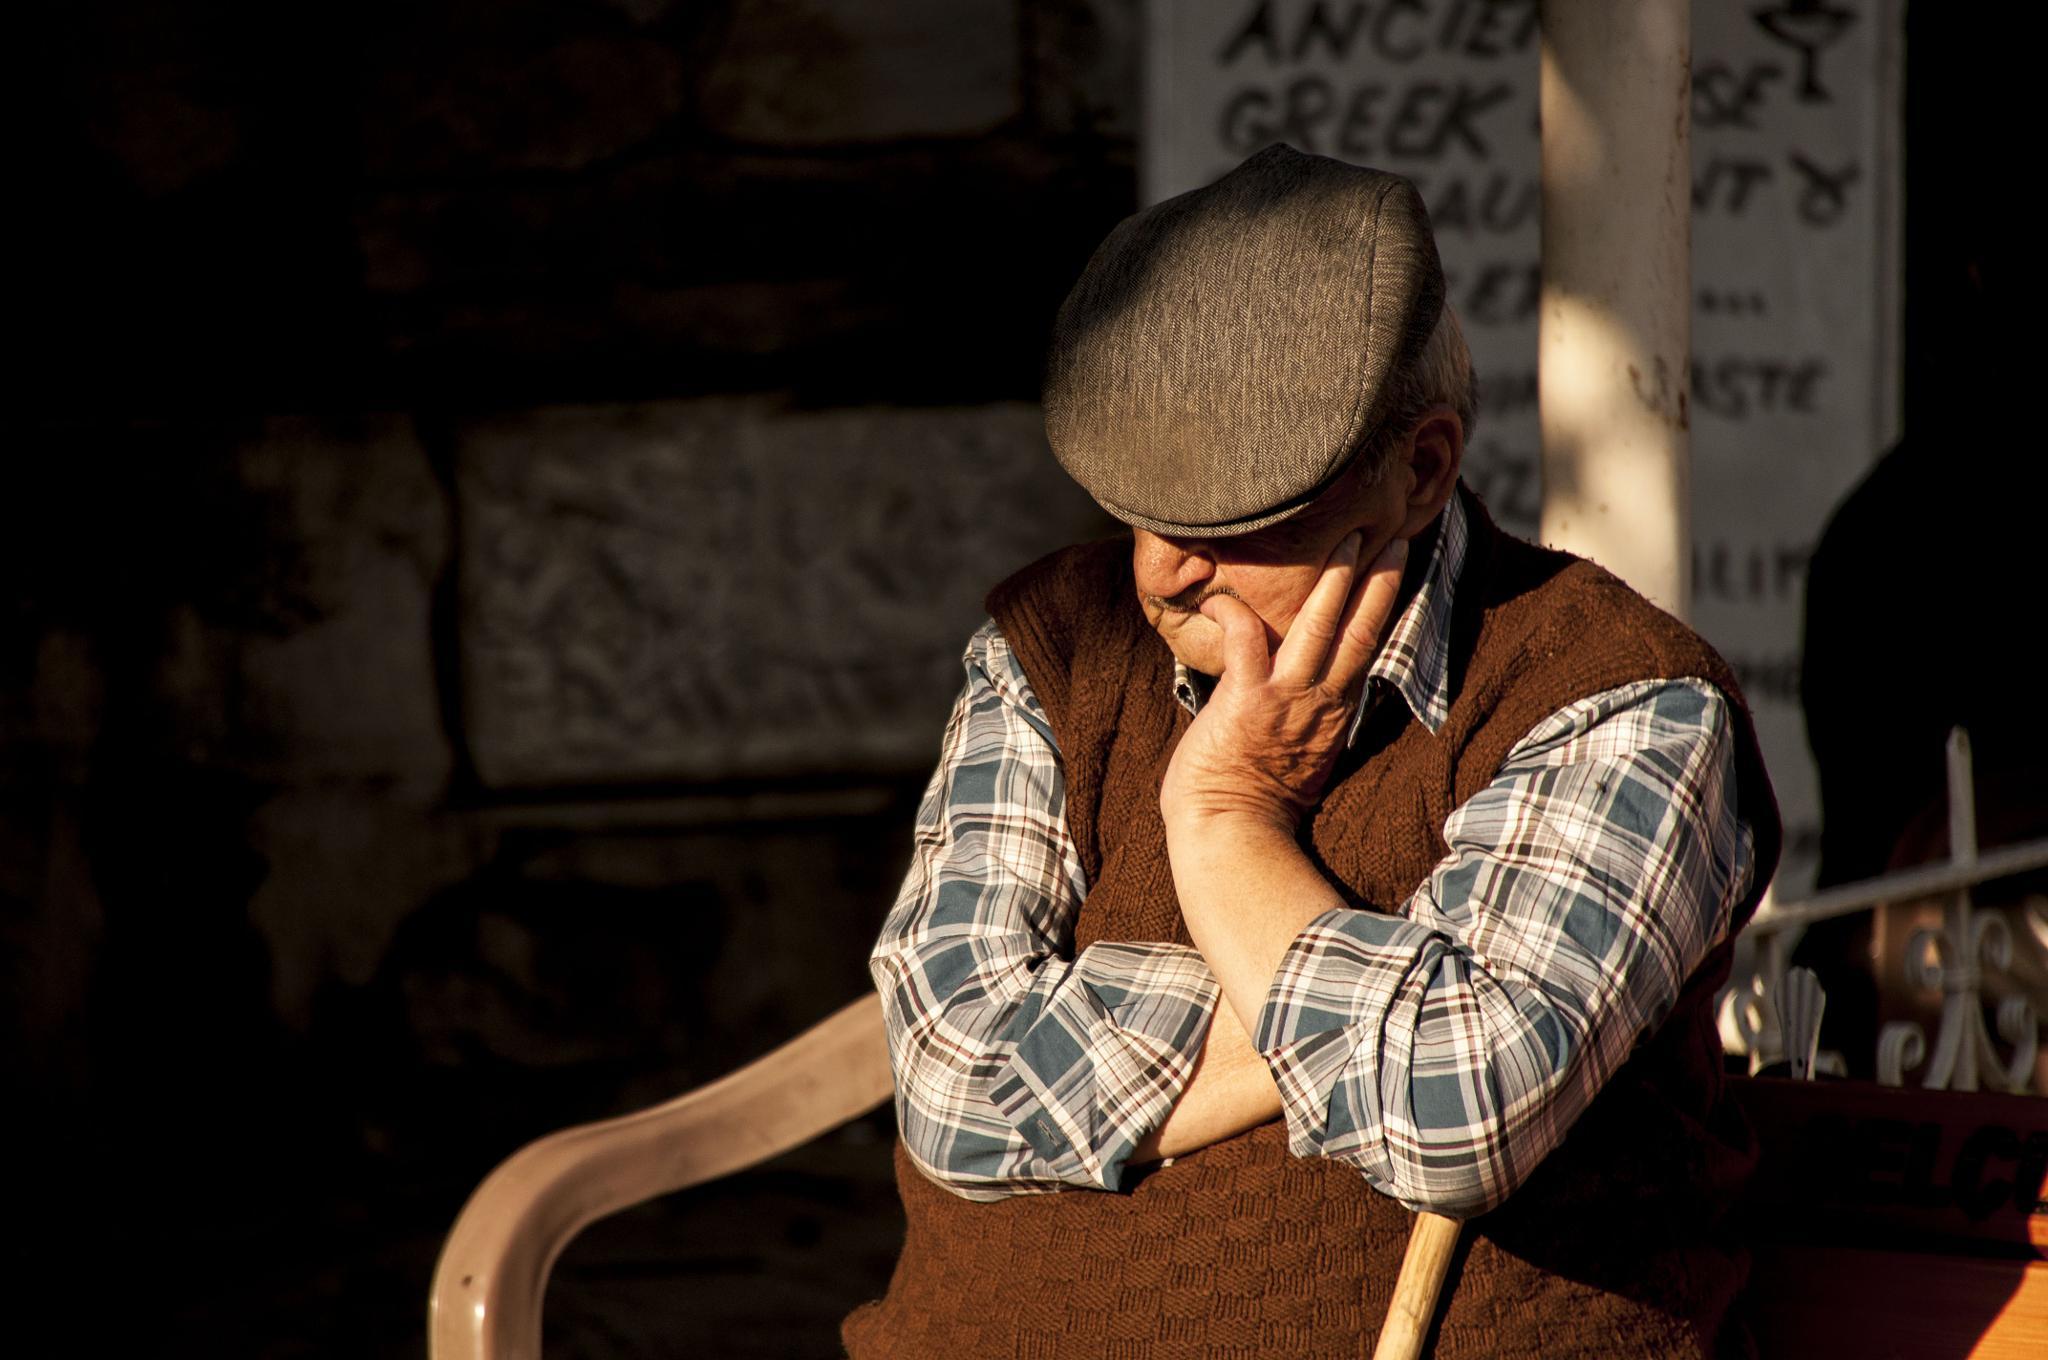 turkish man resting by gorber